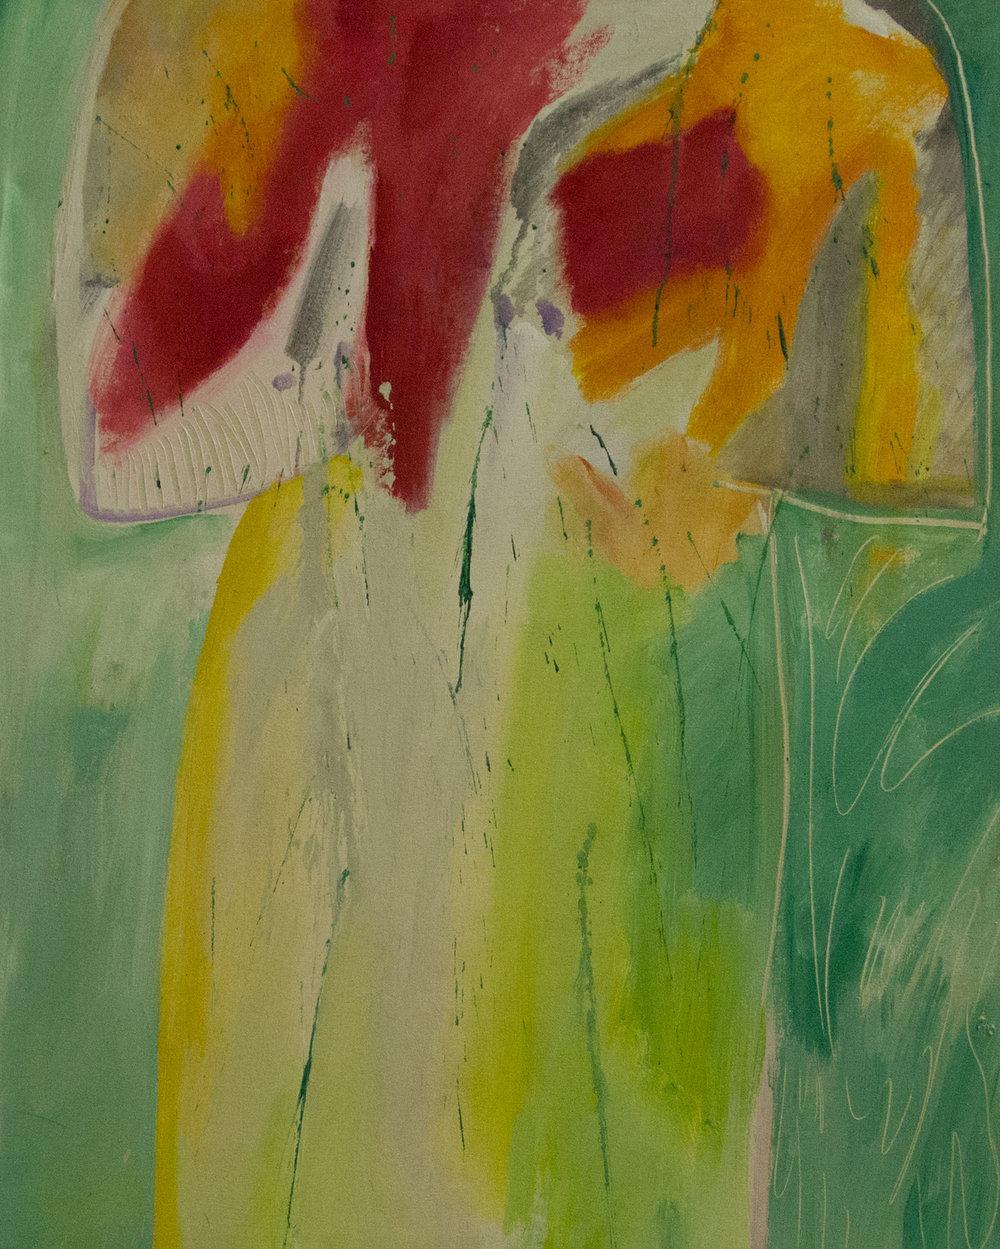 Springtime Kimono,2003. Acrylic on canvas, 43 x 30 in. (109 x 76 cm.)